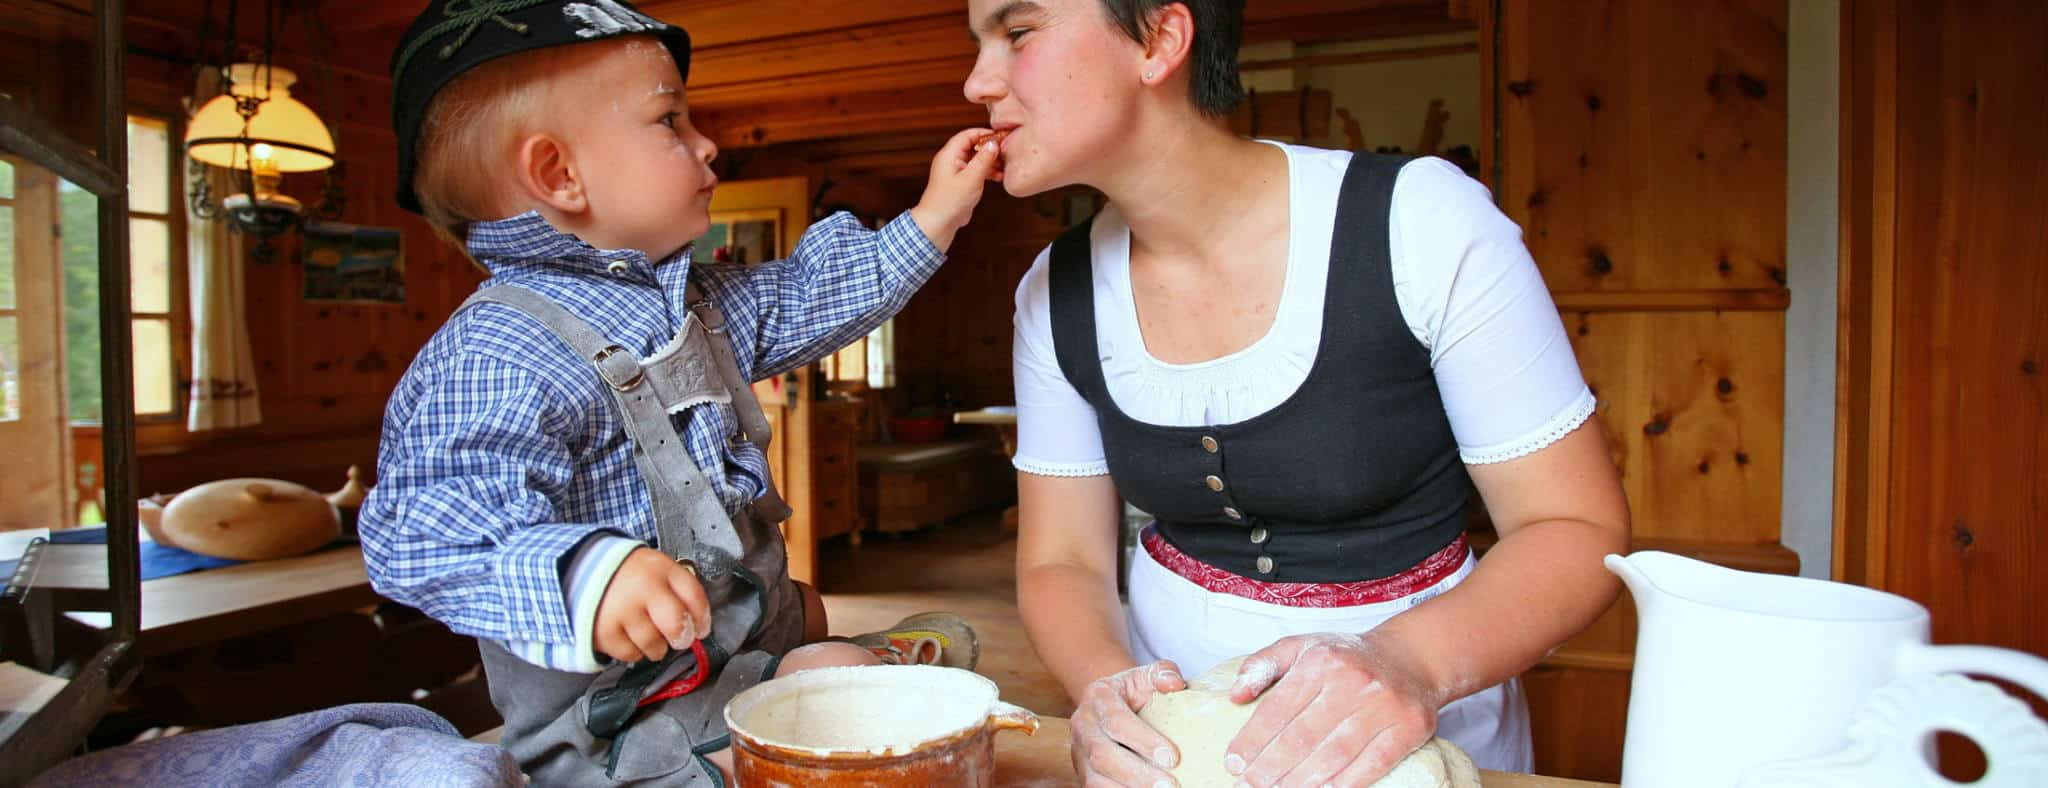 Fäbodsvandring vid Dachstein - Steinitzenalm - Salzkammergut - Semester i Österrike med Austria Travel